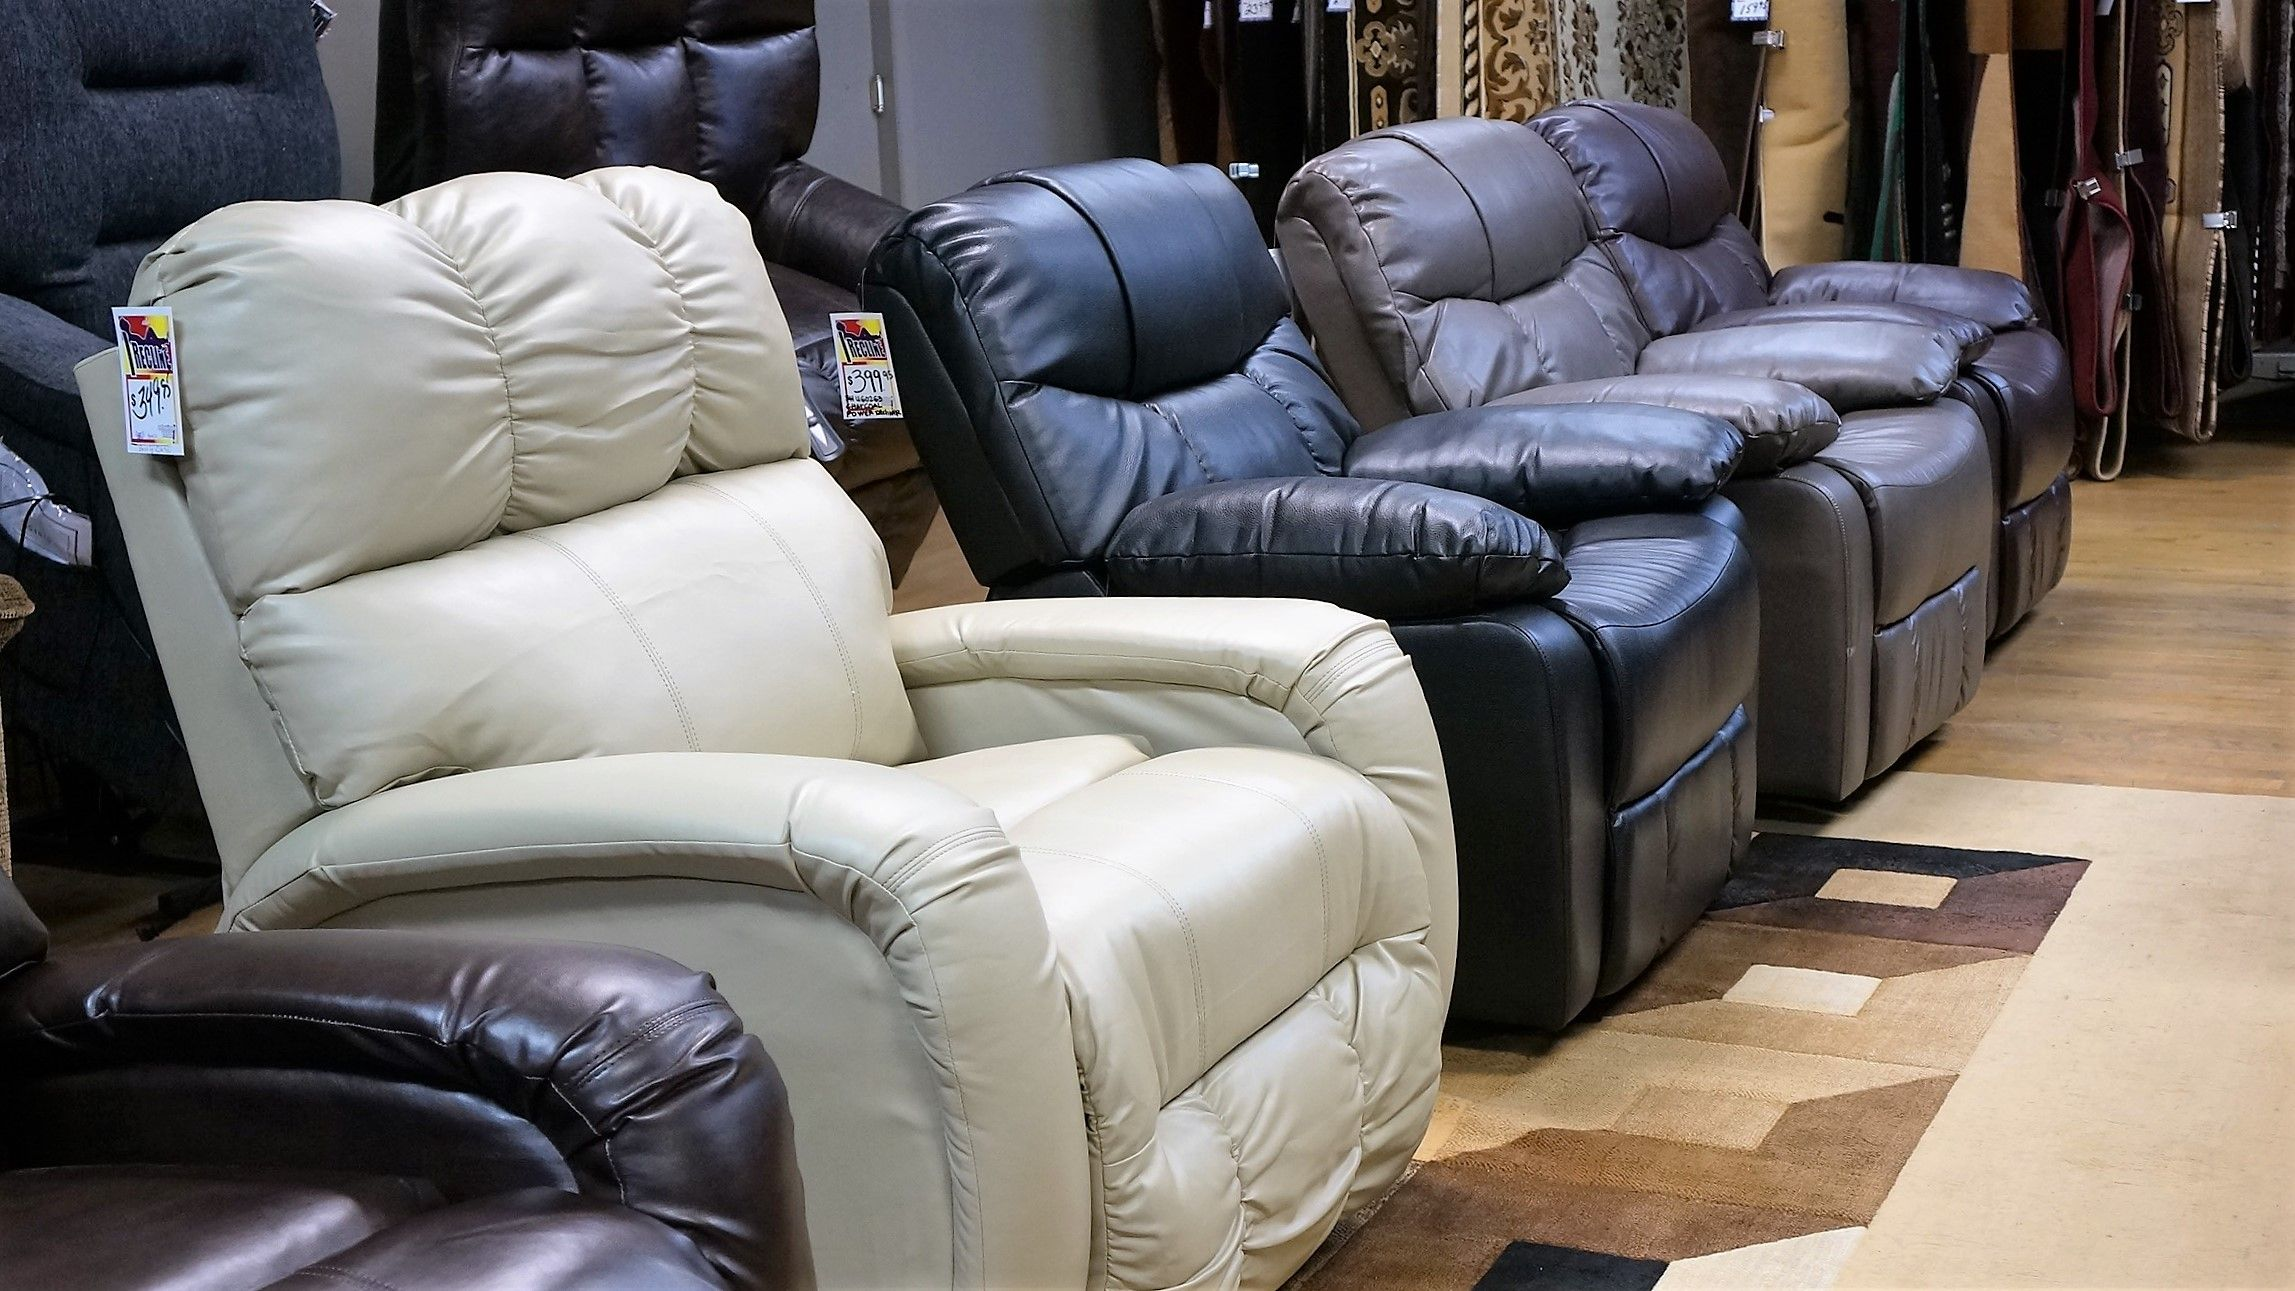 Kansas City Mattresses Kansas City Furniture Store Discount Sales Outlet Overland Park Ks And Kc Mo City Furniture Furniture Store Furniture